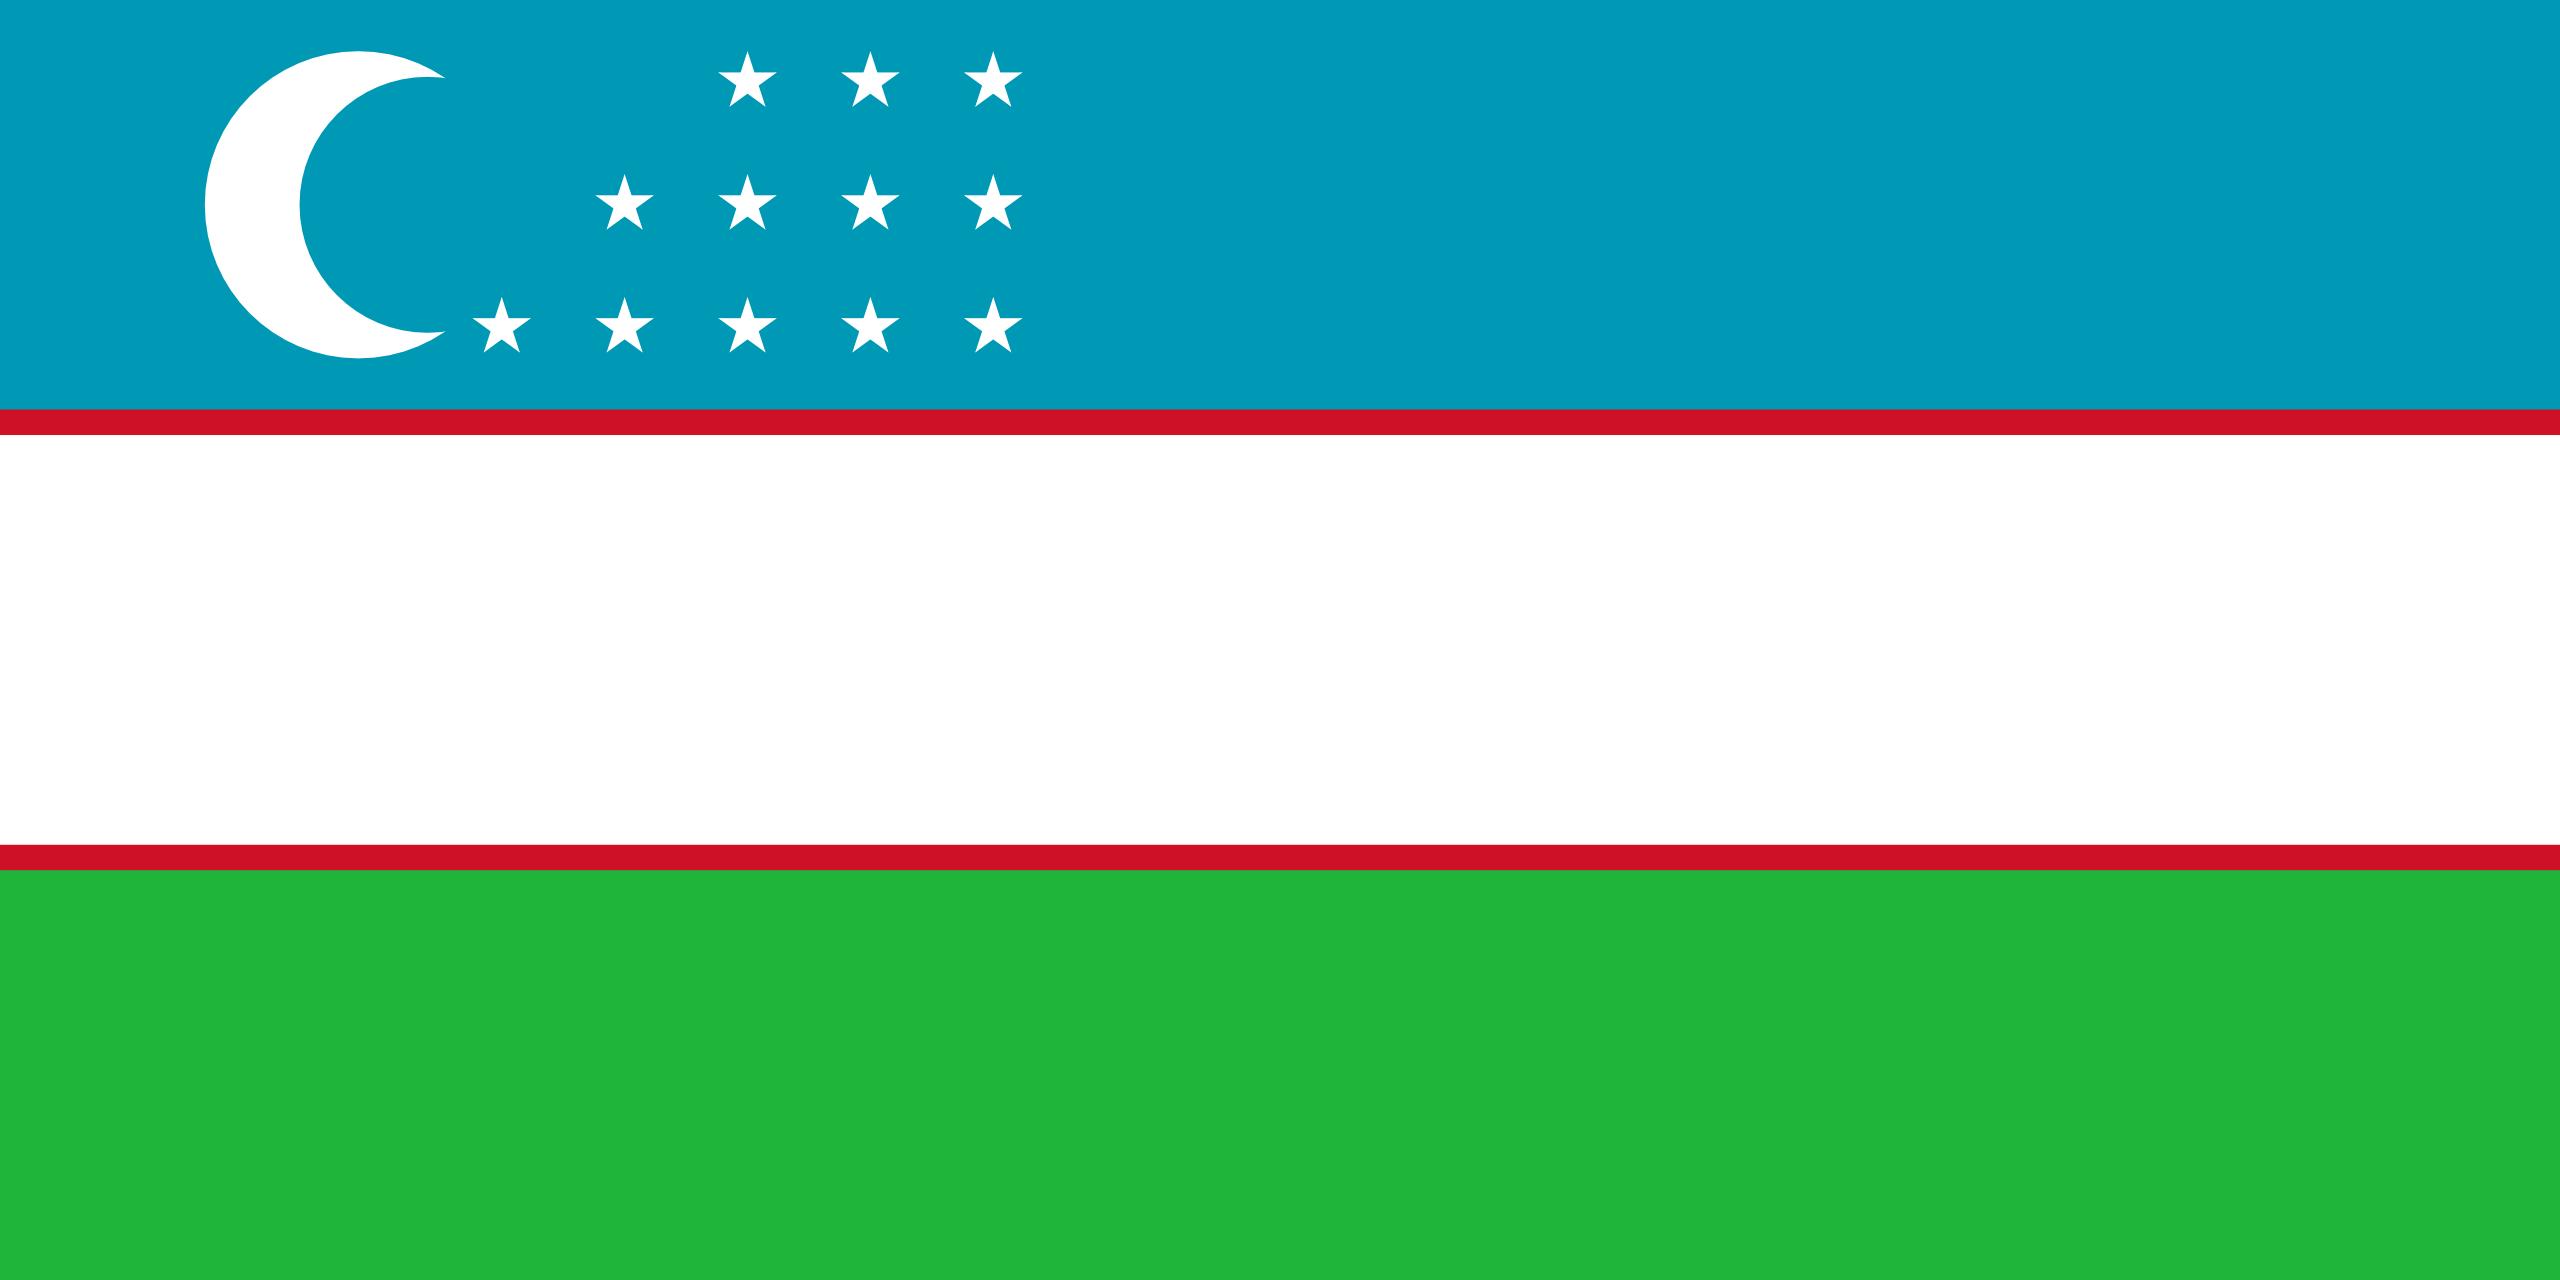 Ouzbékistan, pays, emblème, logo, symbole - Fonds d'écran HD - Professor-falken.com